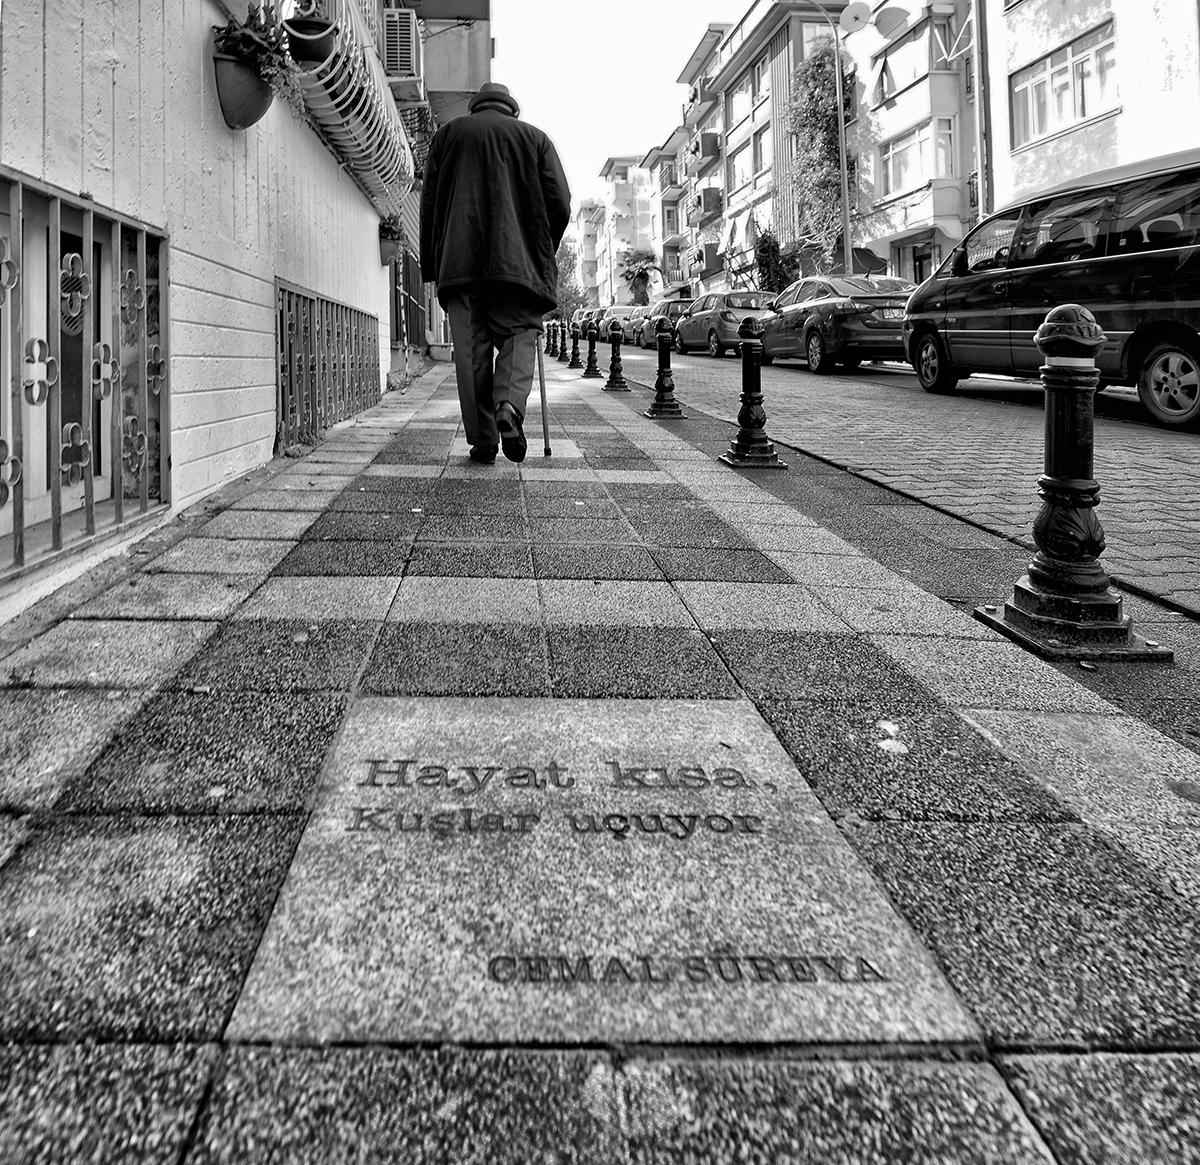 Day 11 —Kadıköy - Poet Cemal Süreya's poems immortalized in the pavement stones of Cemal Süreya Street in Kadıköy.